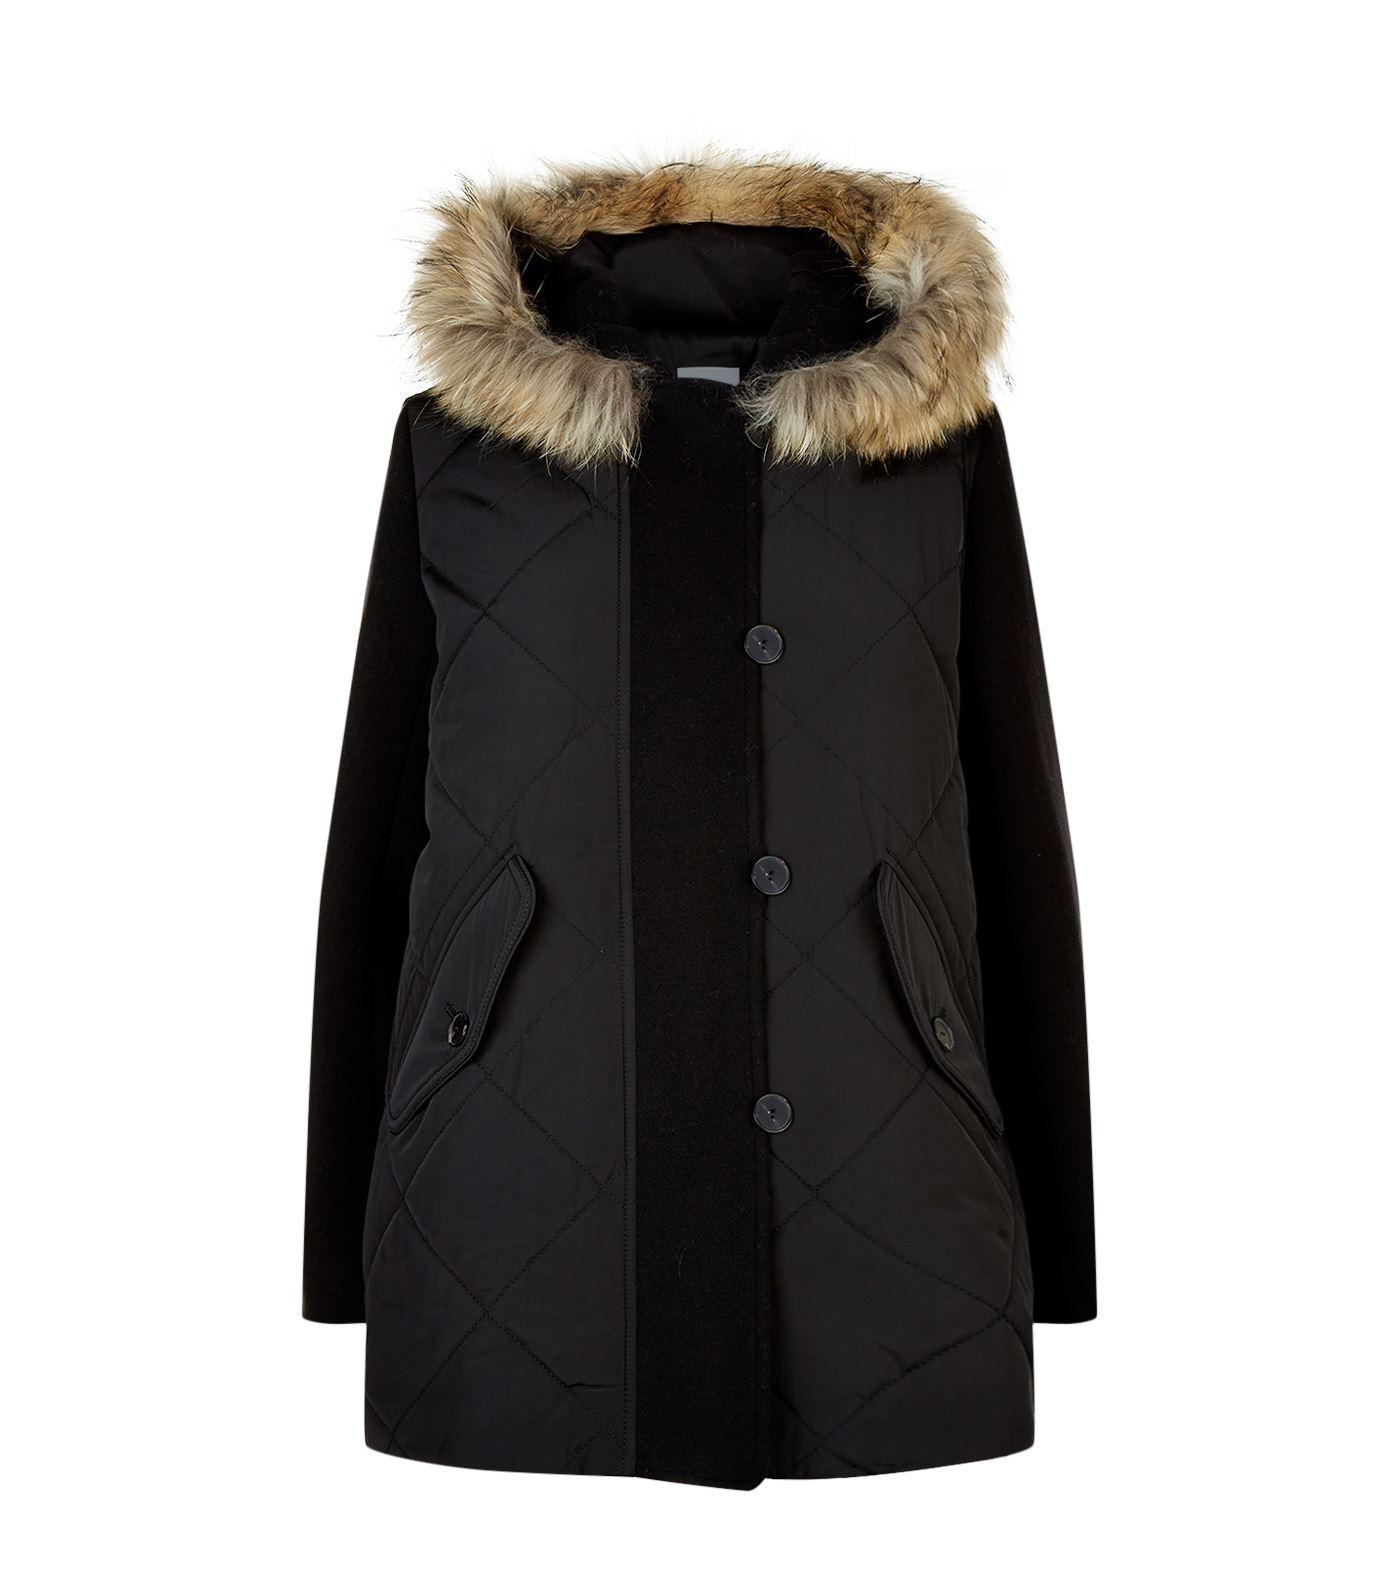 Sandro Fur Trim Hooded Coat In Black